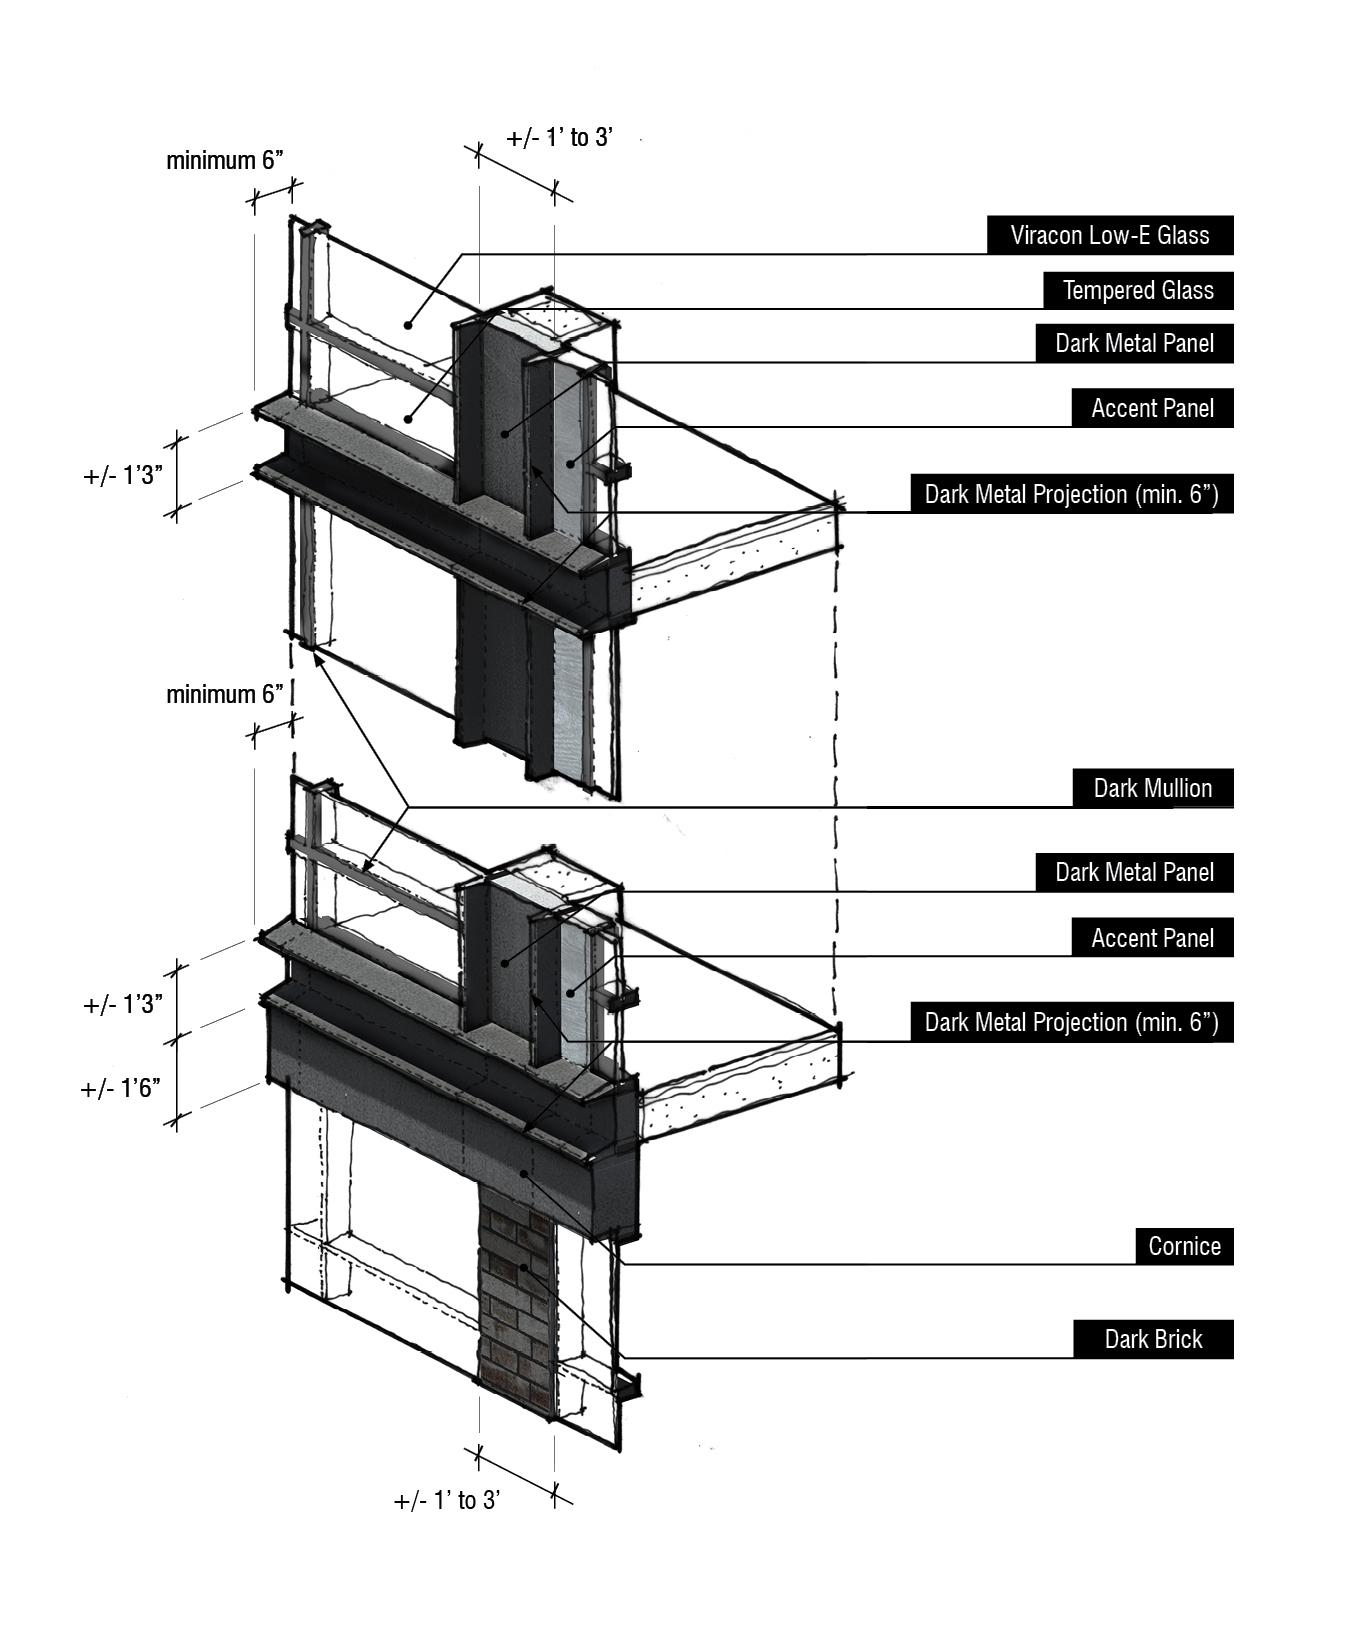 2014_10_02_136065_P03_Concept-Presentation_11x1722B.jpg